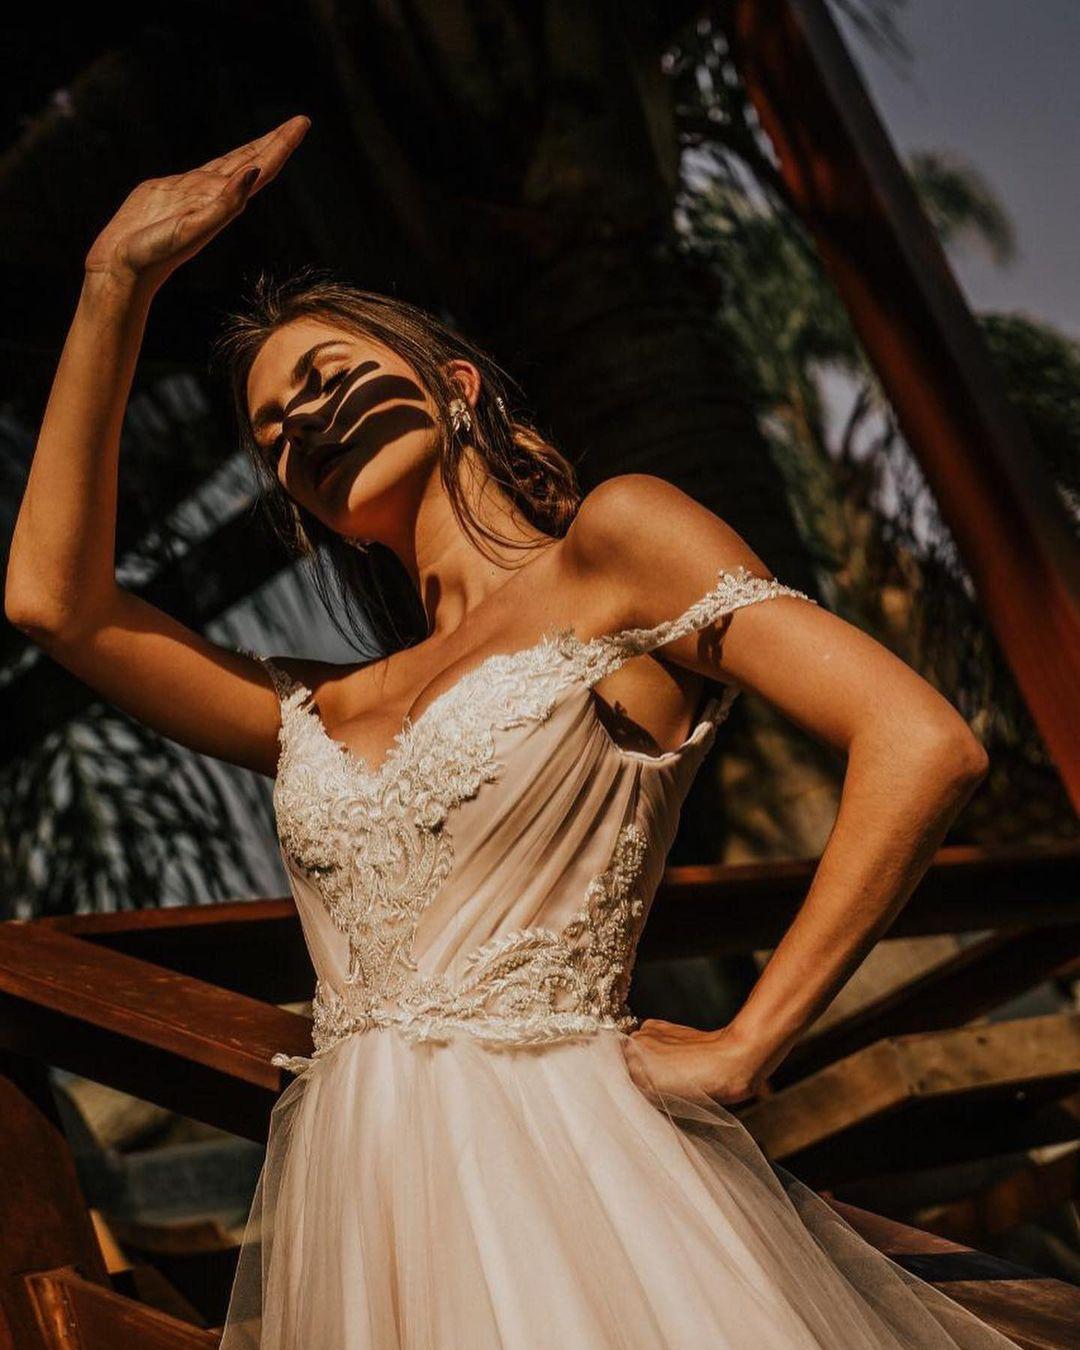 ana flavia giacomini, miss ilha dos lobos mundo 2019. - Página 3 Fvkgux10